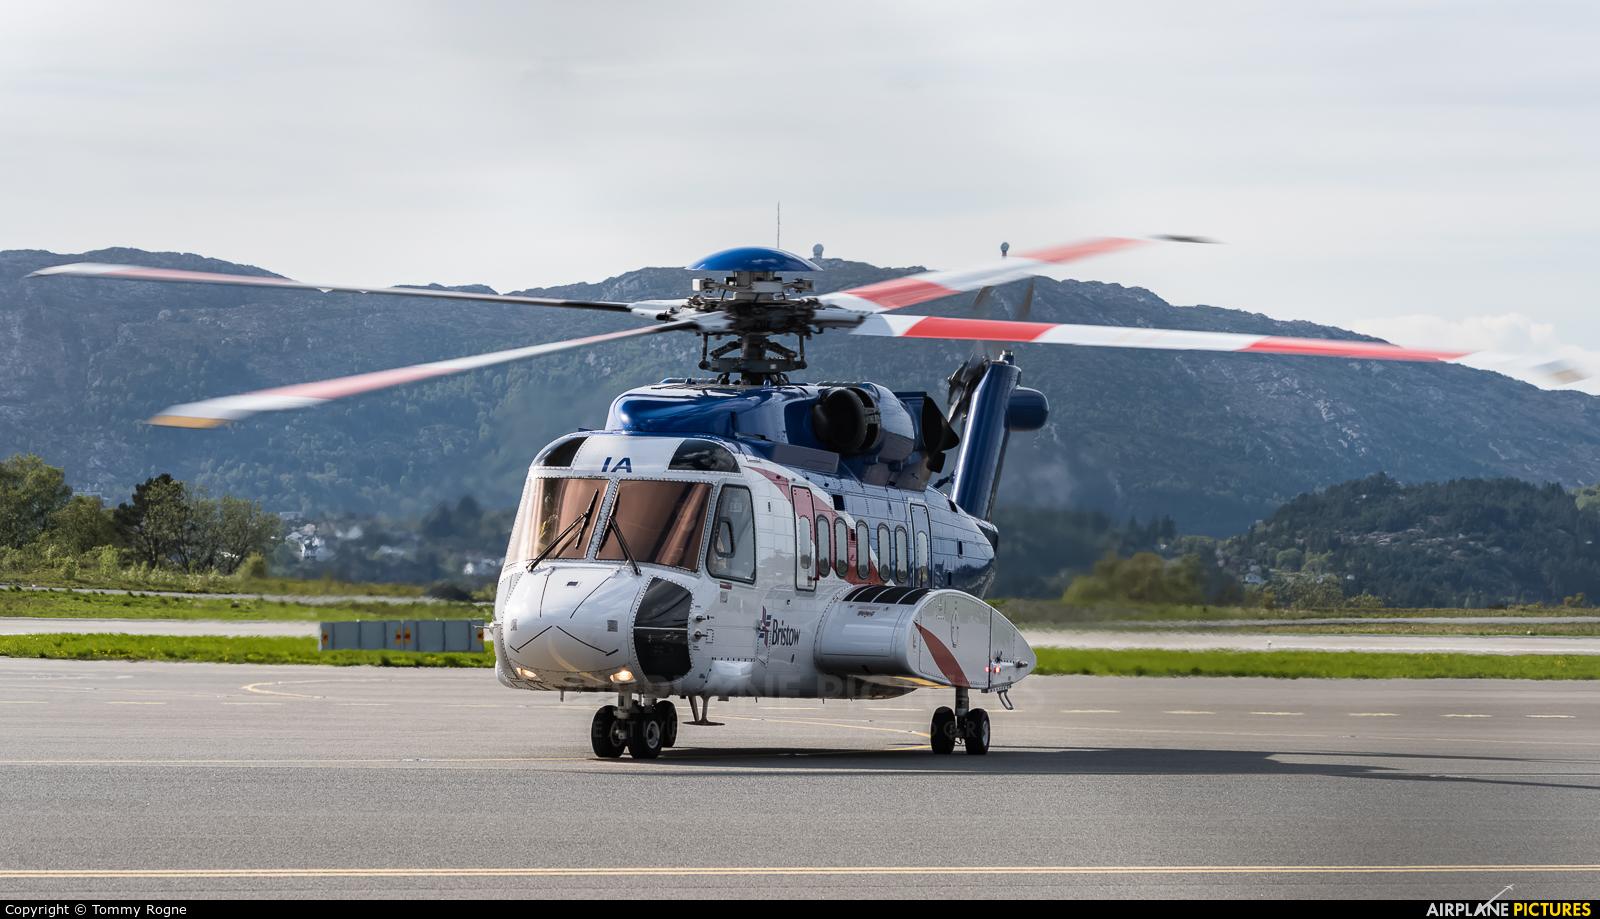 Bristow Norway LN-OIA aircraft at Bergen - Flesland